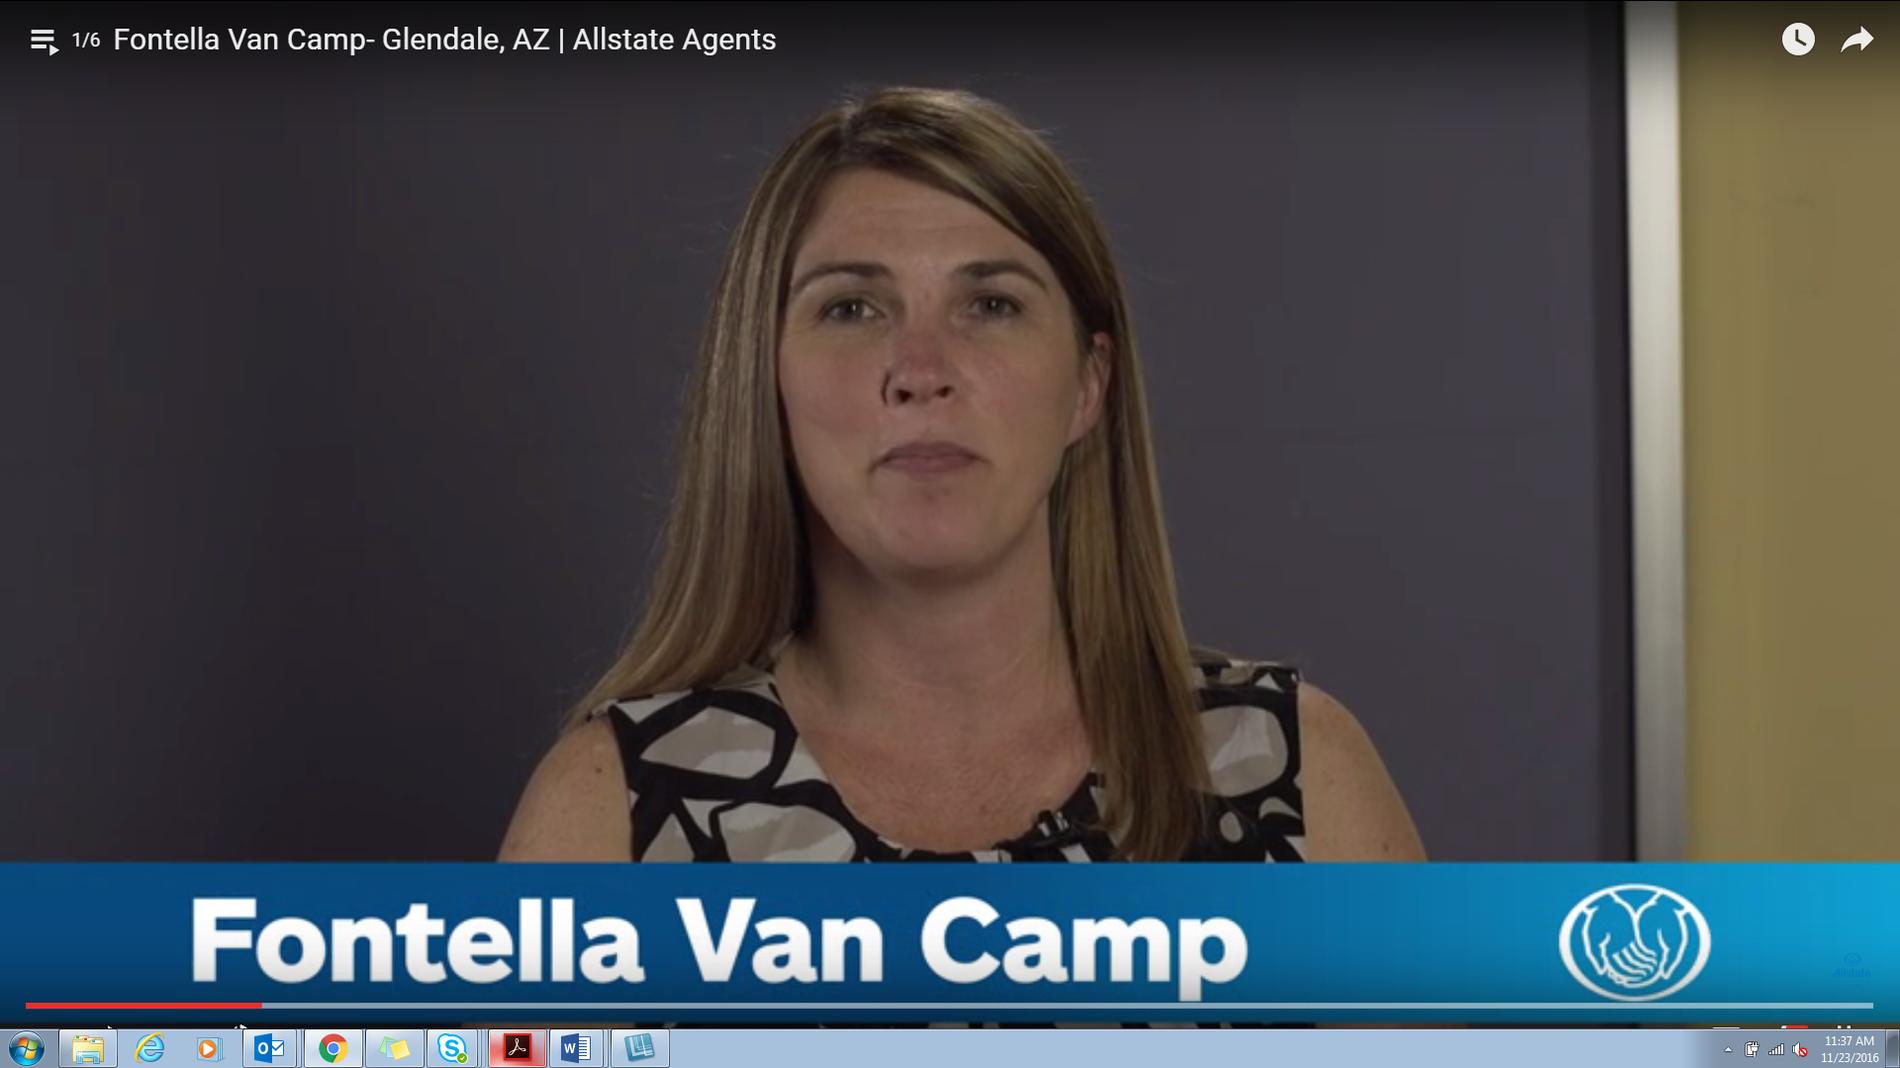 Allstate | Car Insurance in Glendale, AZ - Fontella Van Camp